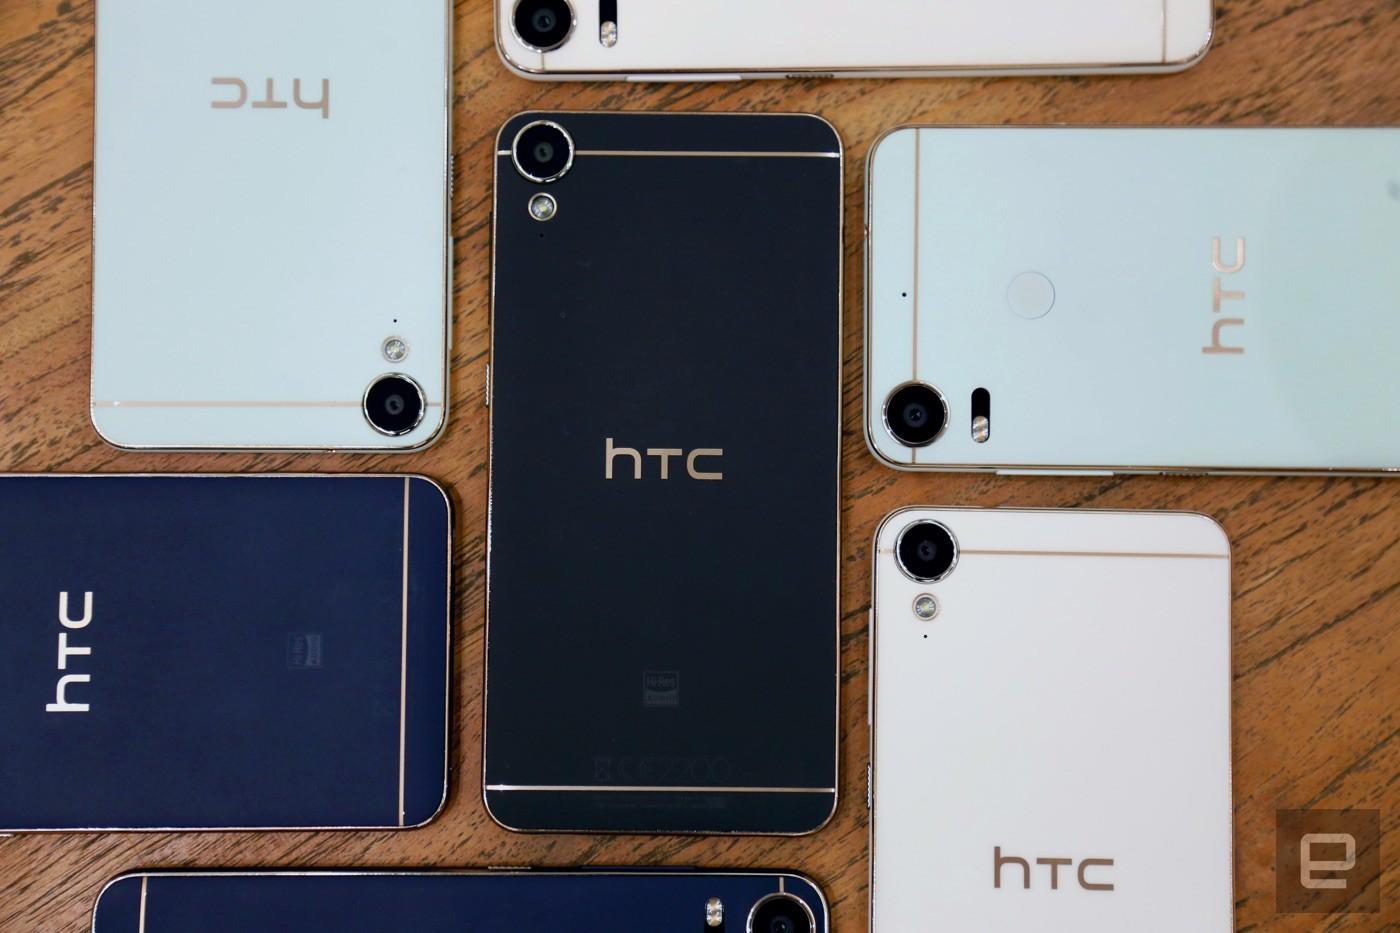 desire10 04 - Smartphone tầm trung HTC Desire 10 ra mắt